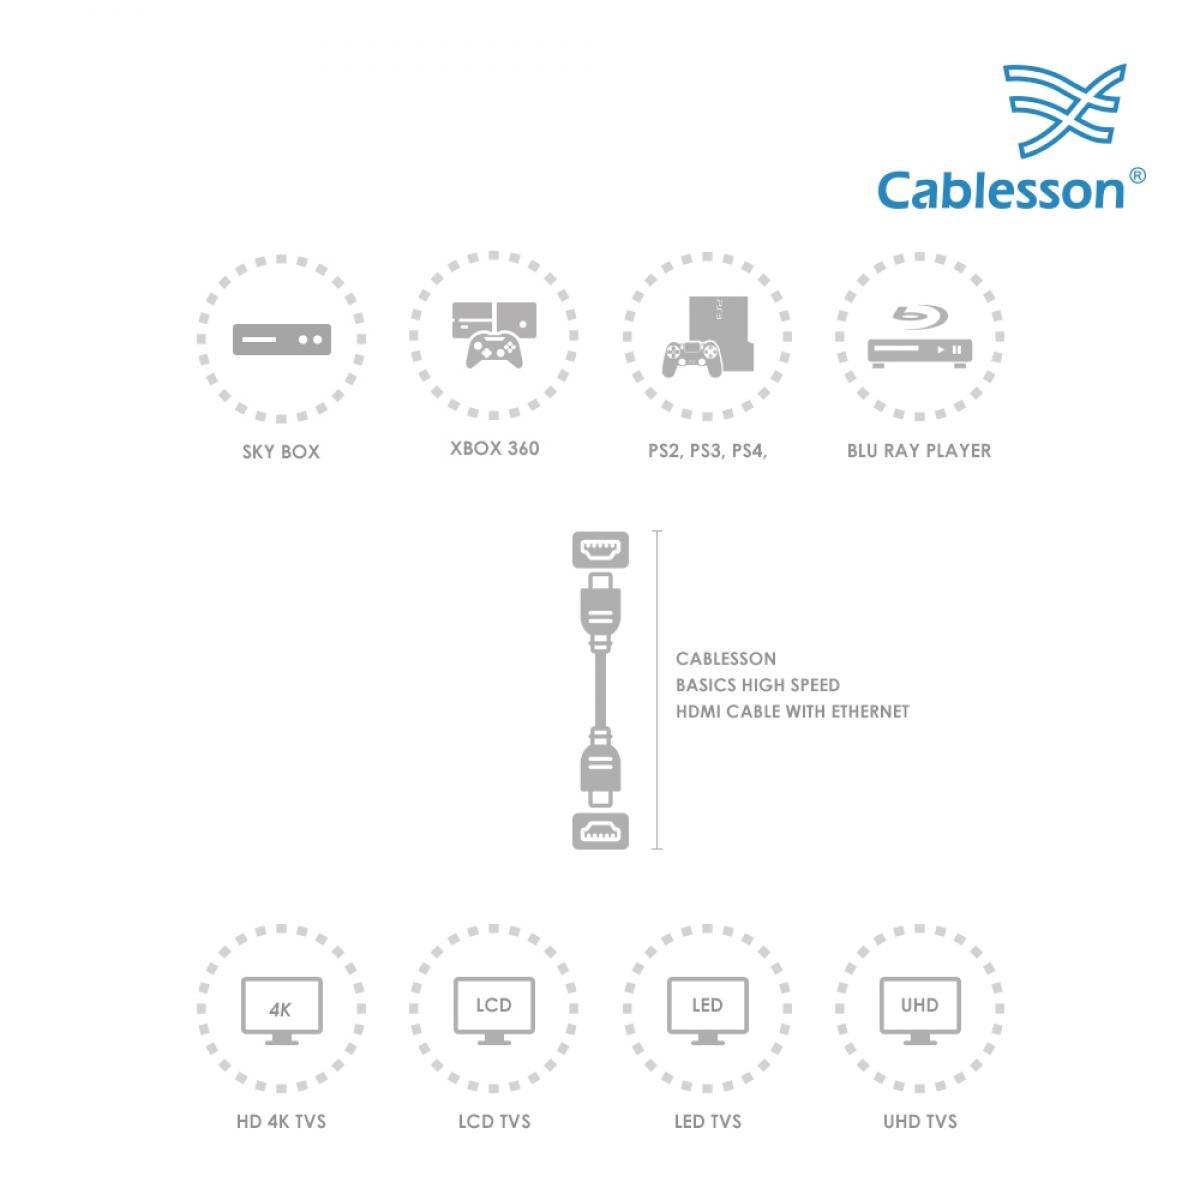 Cablesson Ikuna Cable 7m HDMI de Alta Velocidad UHD Sky Q 2160p para PS4 Full HD HDMI Tipo A, HDMI 2.1//2.0b // 2.0a // 2.0//1.4 HDR ARC Xbox One LCD Ultra HD - 4K LED 3D UHD Wii